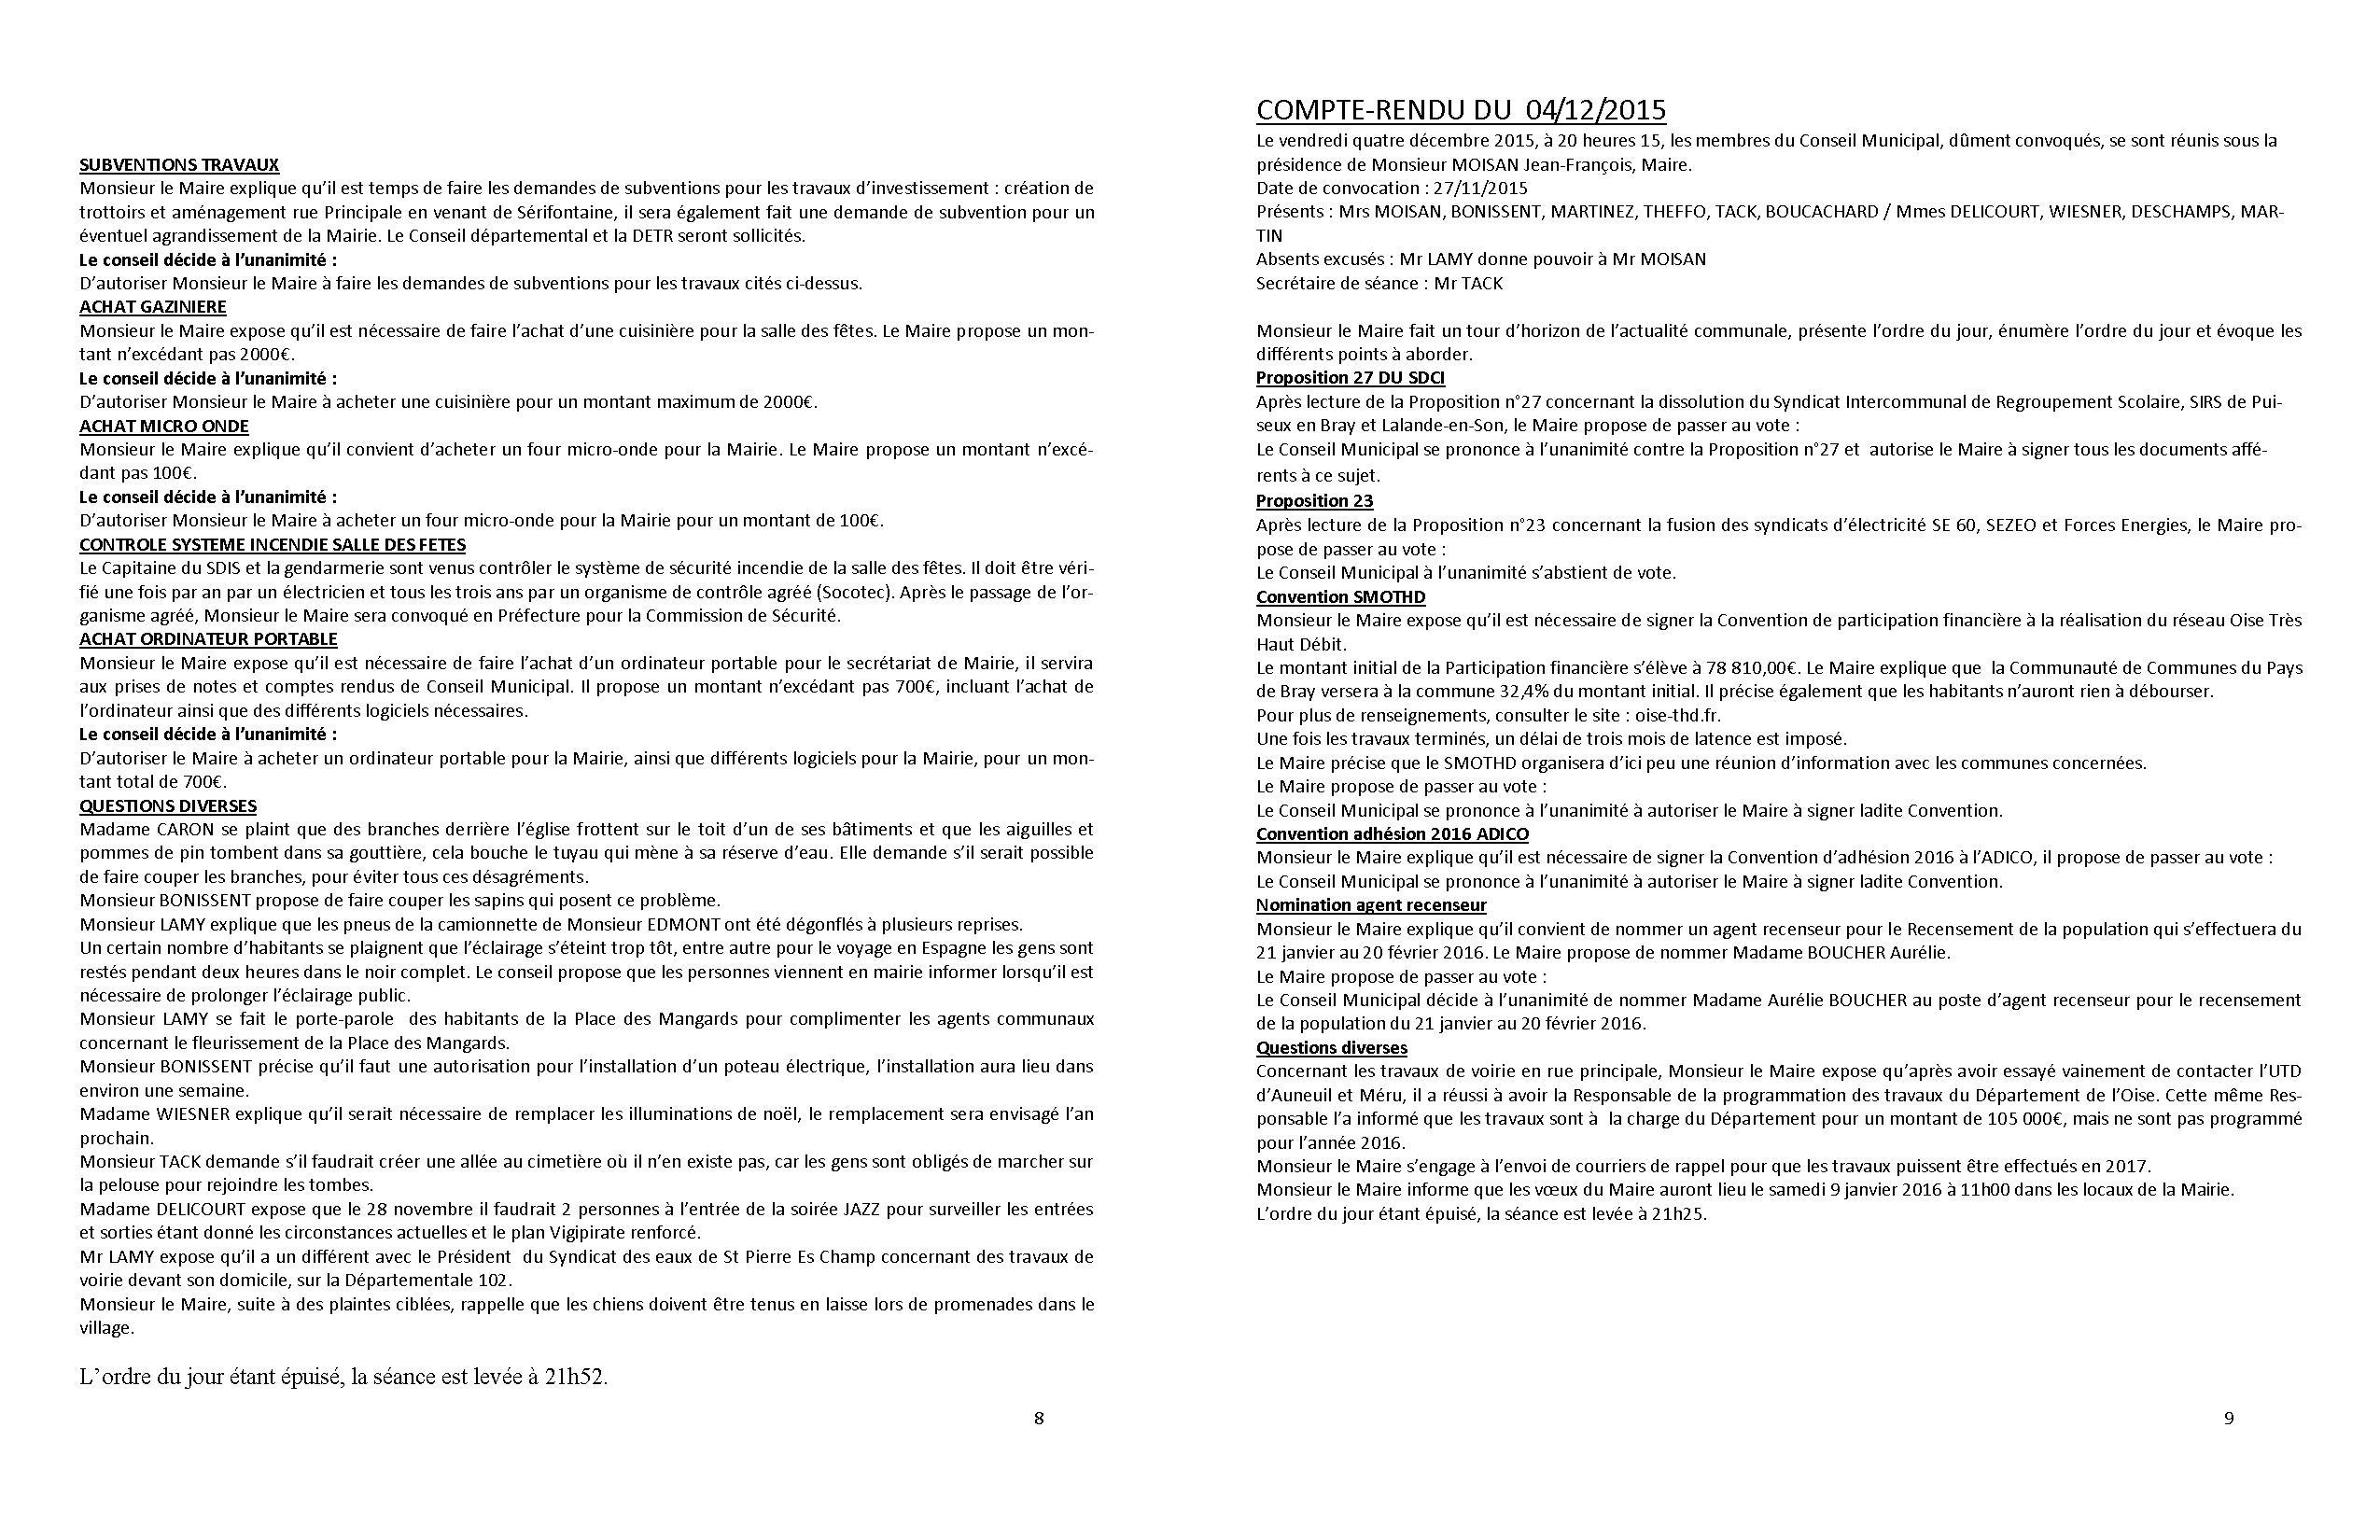 petit-journal-dec-15-8-9